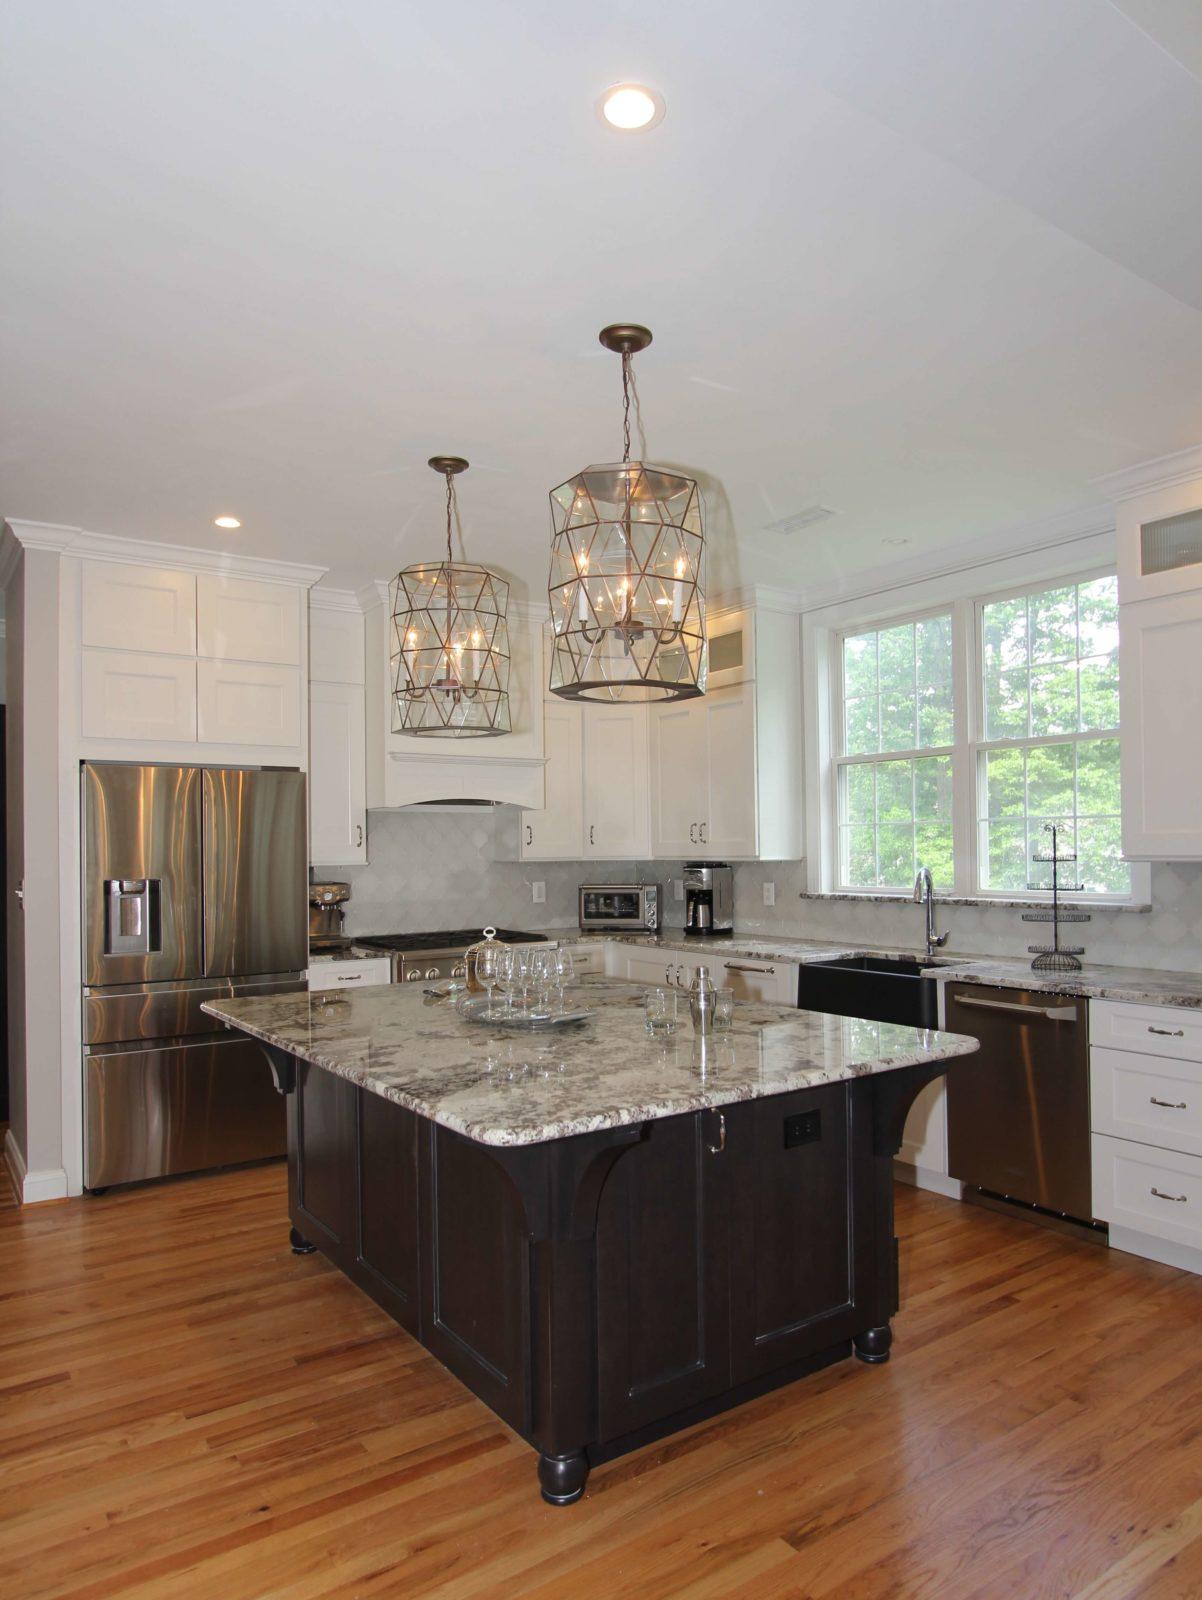 Kitchen Remodeling: Monkton Elegant Pendant Light | Taylor Made Custom  Contracting, Inc.